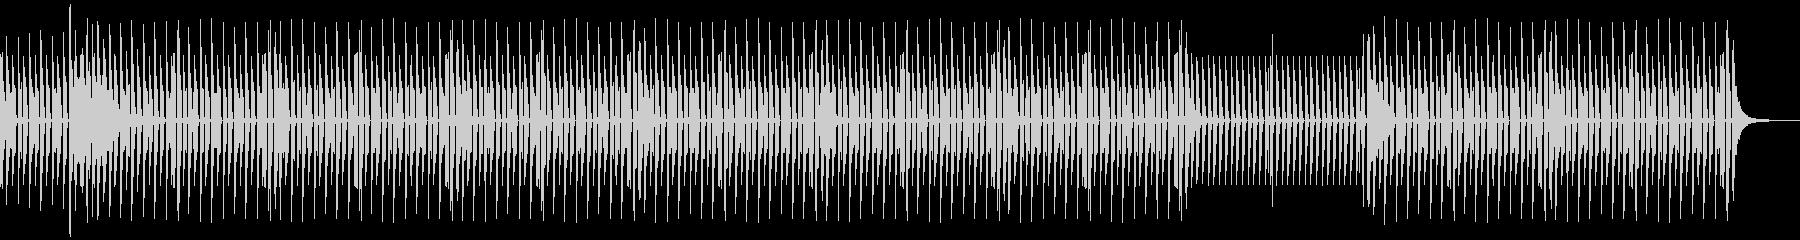 News5 ドラムのみ16bit48kの未再生の波形